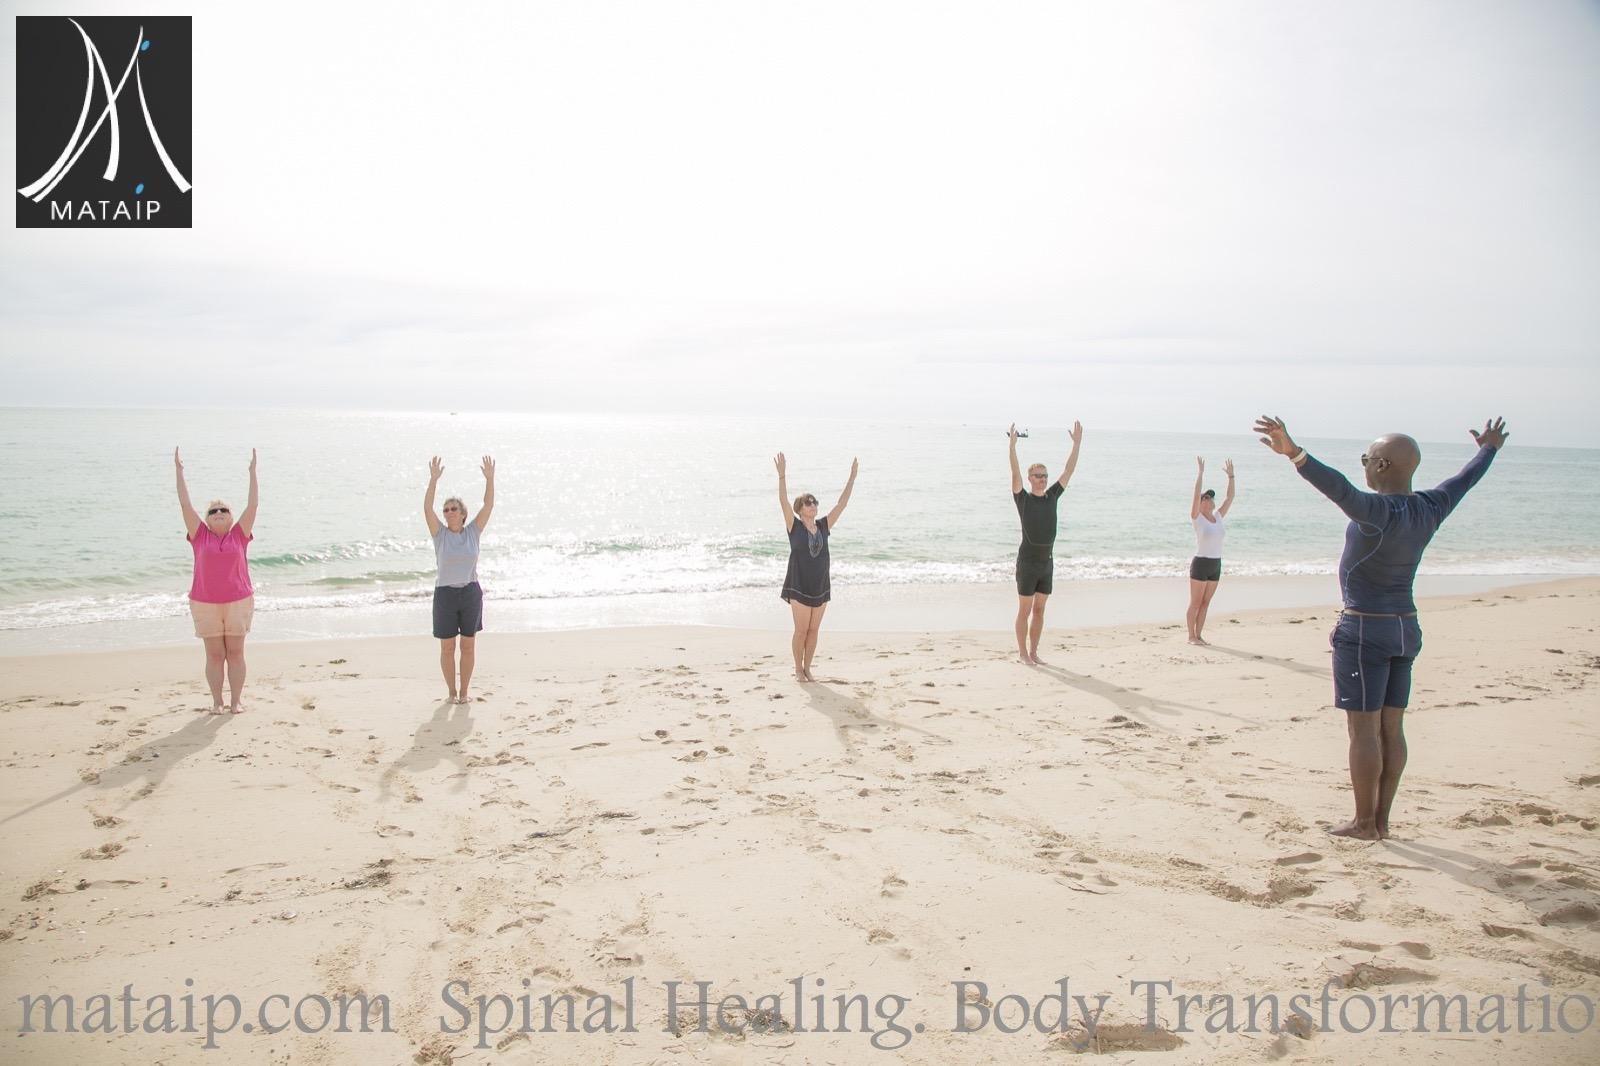 MATAIP Yoga Pilates and Wellbeing Retreat